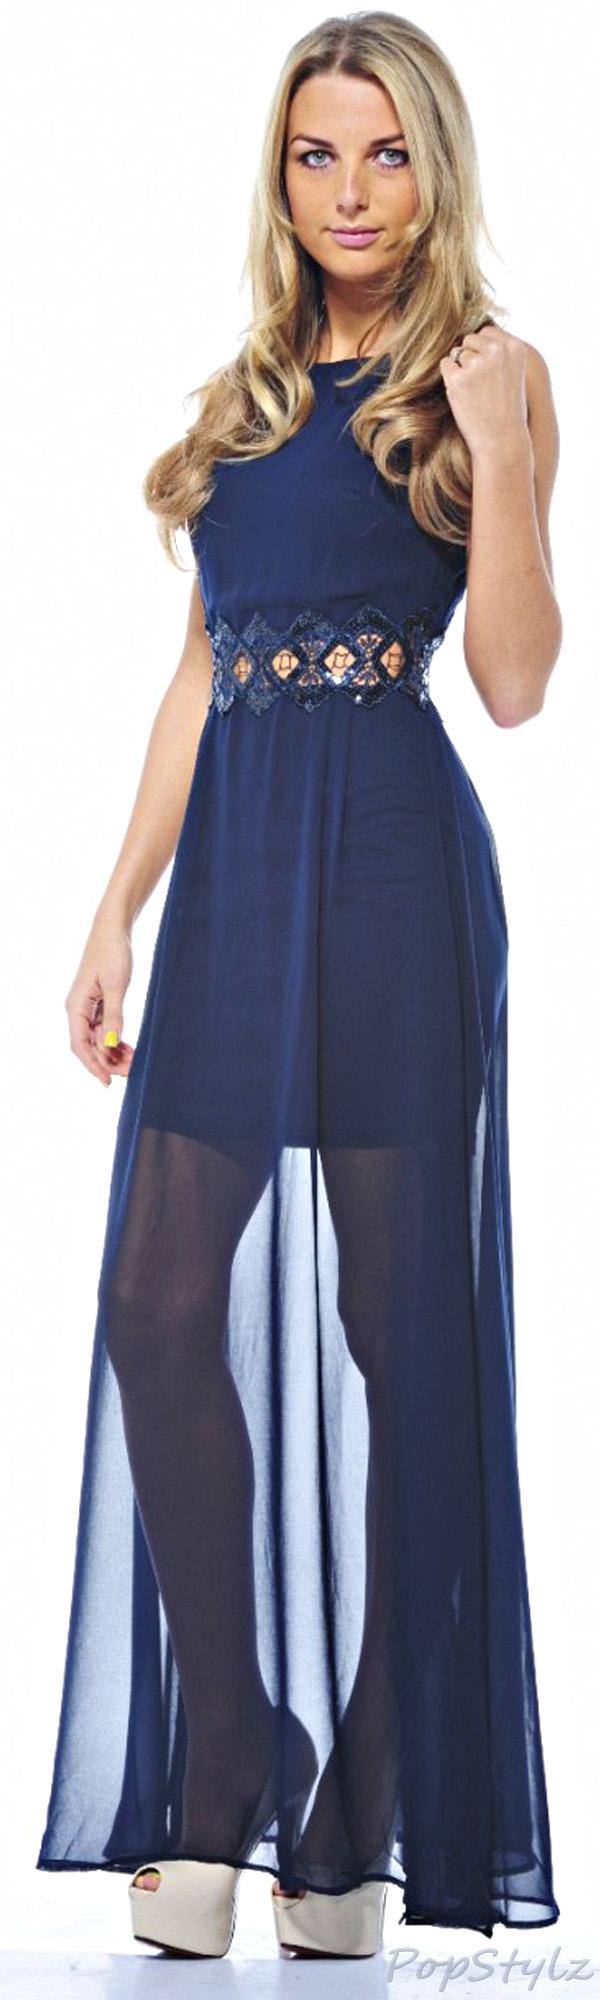 AX Paris Sheer Chiffon Embellished Waist Navy Dress